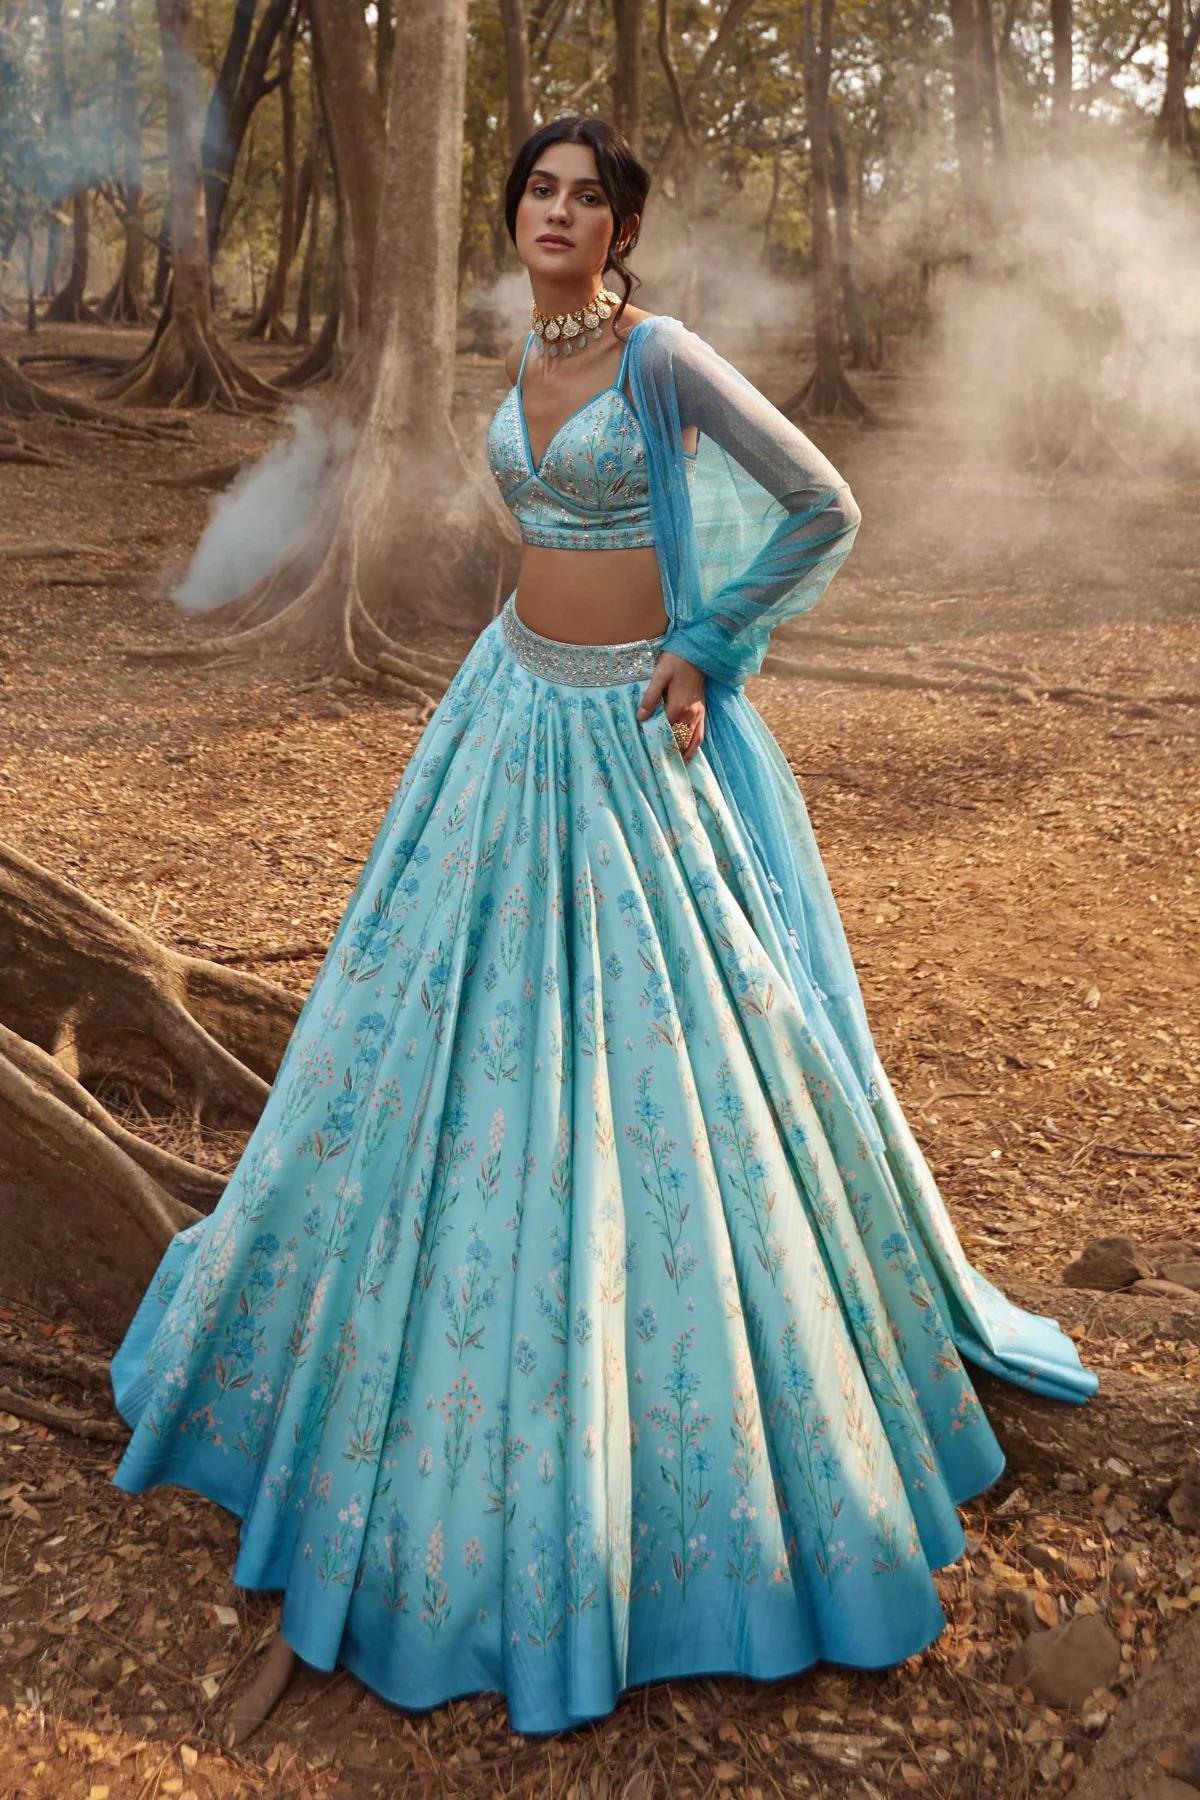 Anita Dongre ice blue wedding dress